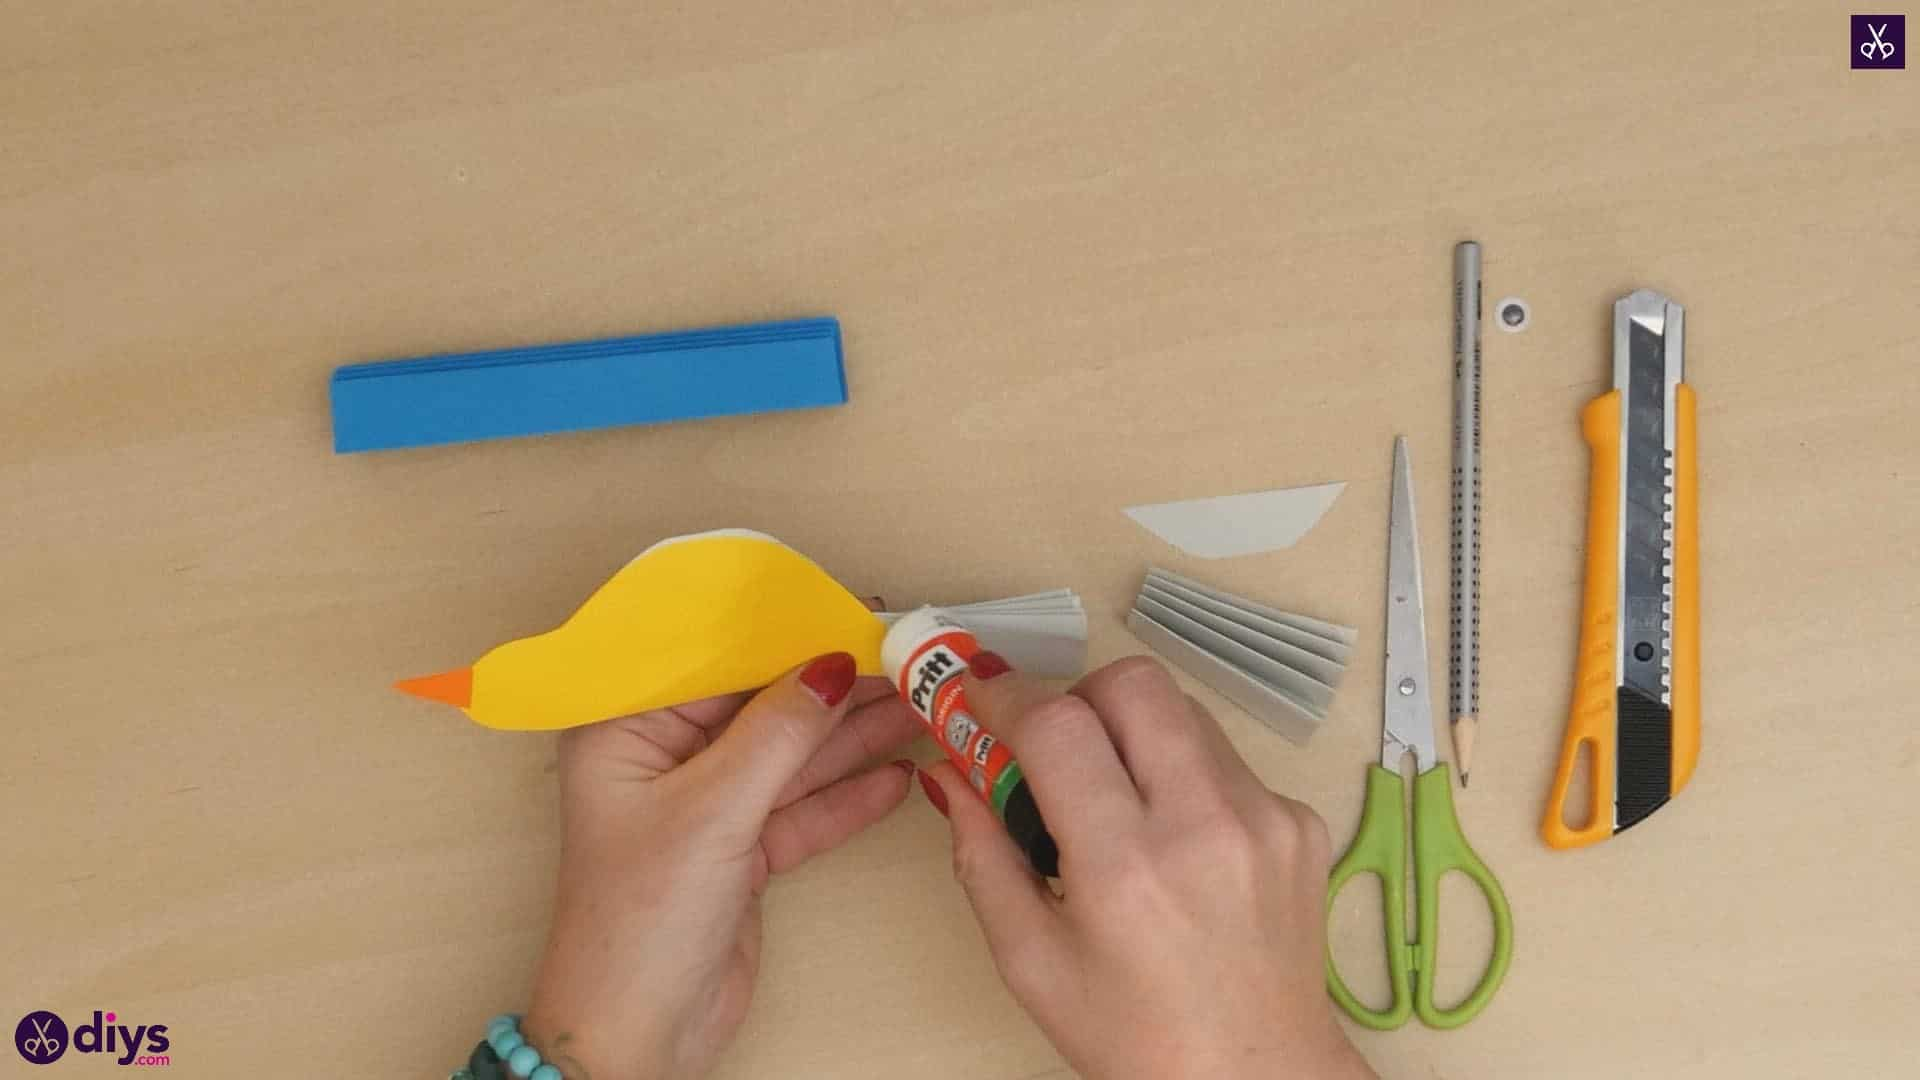 Diy easy paper bird step 11b